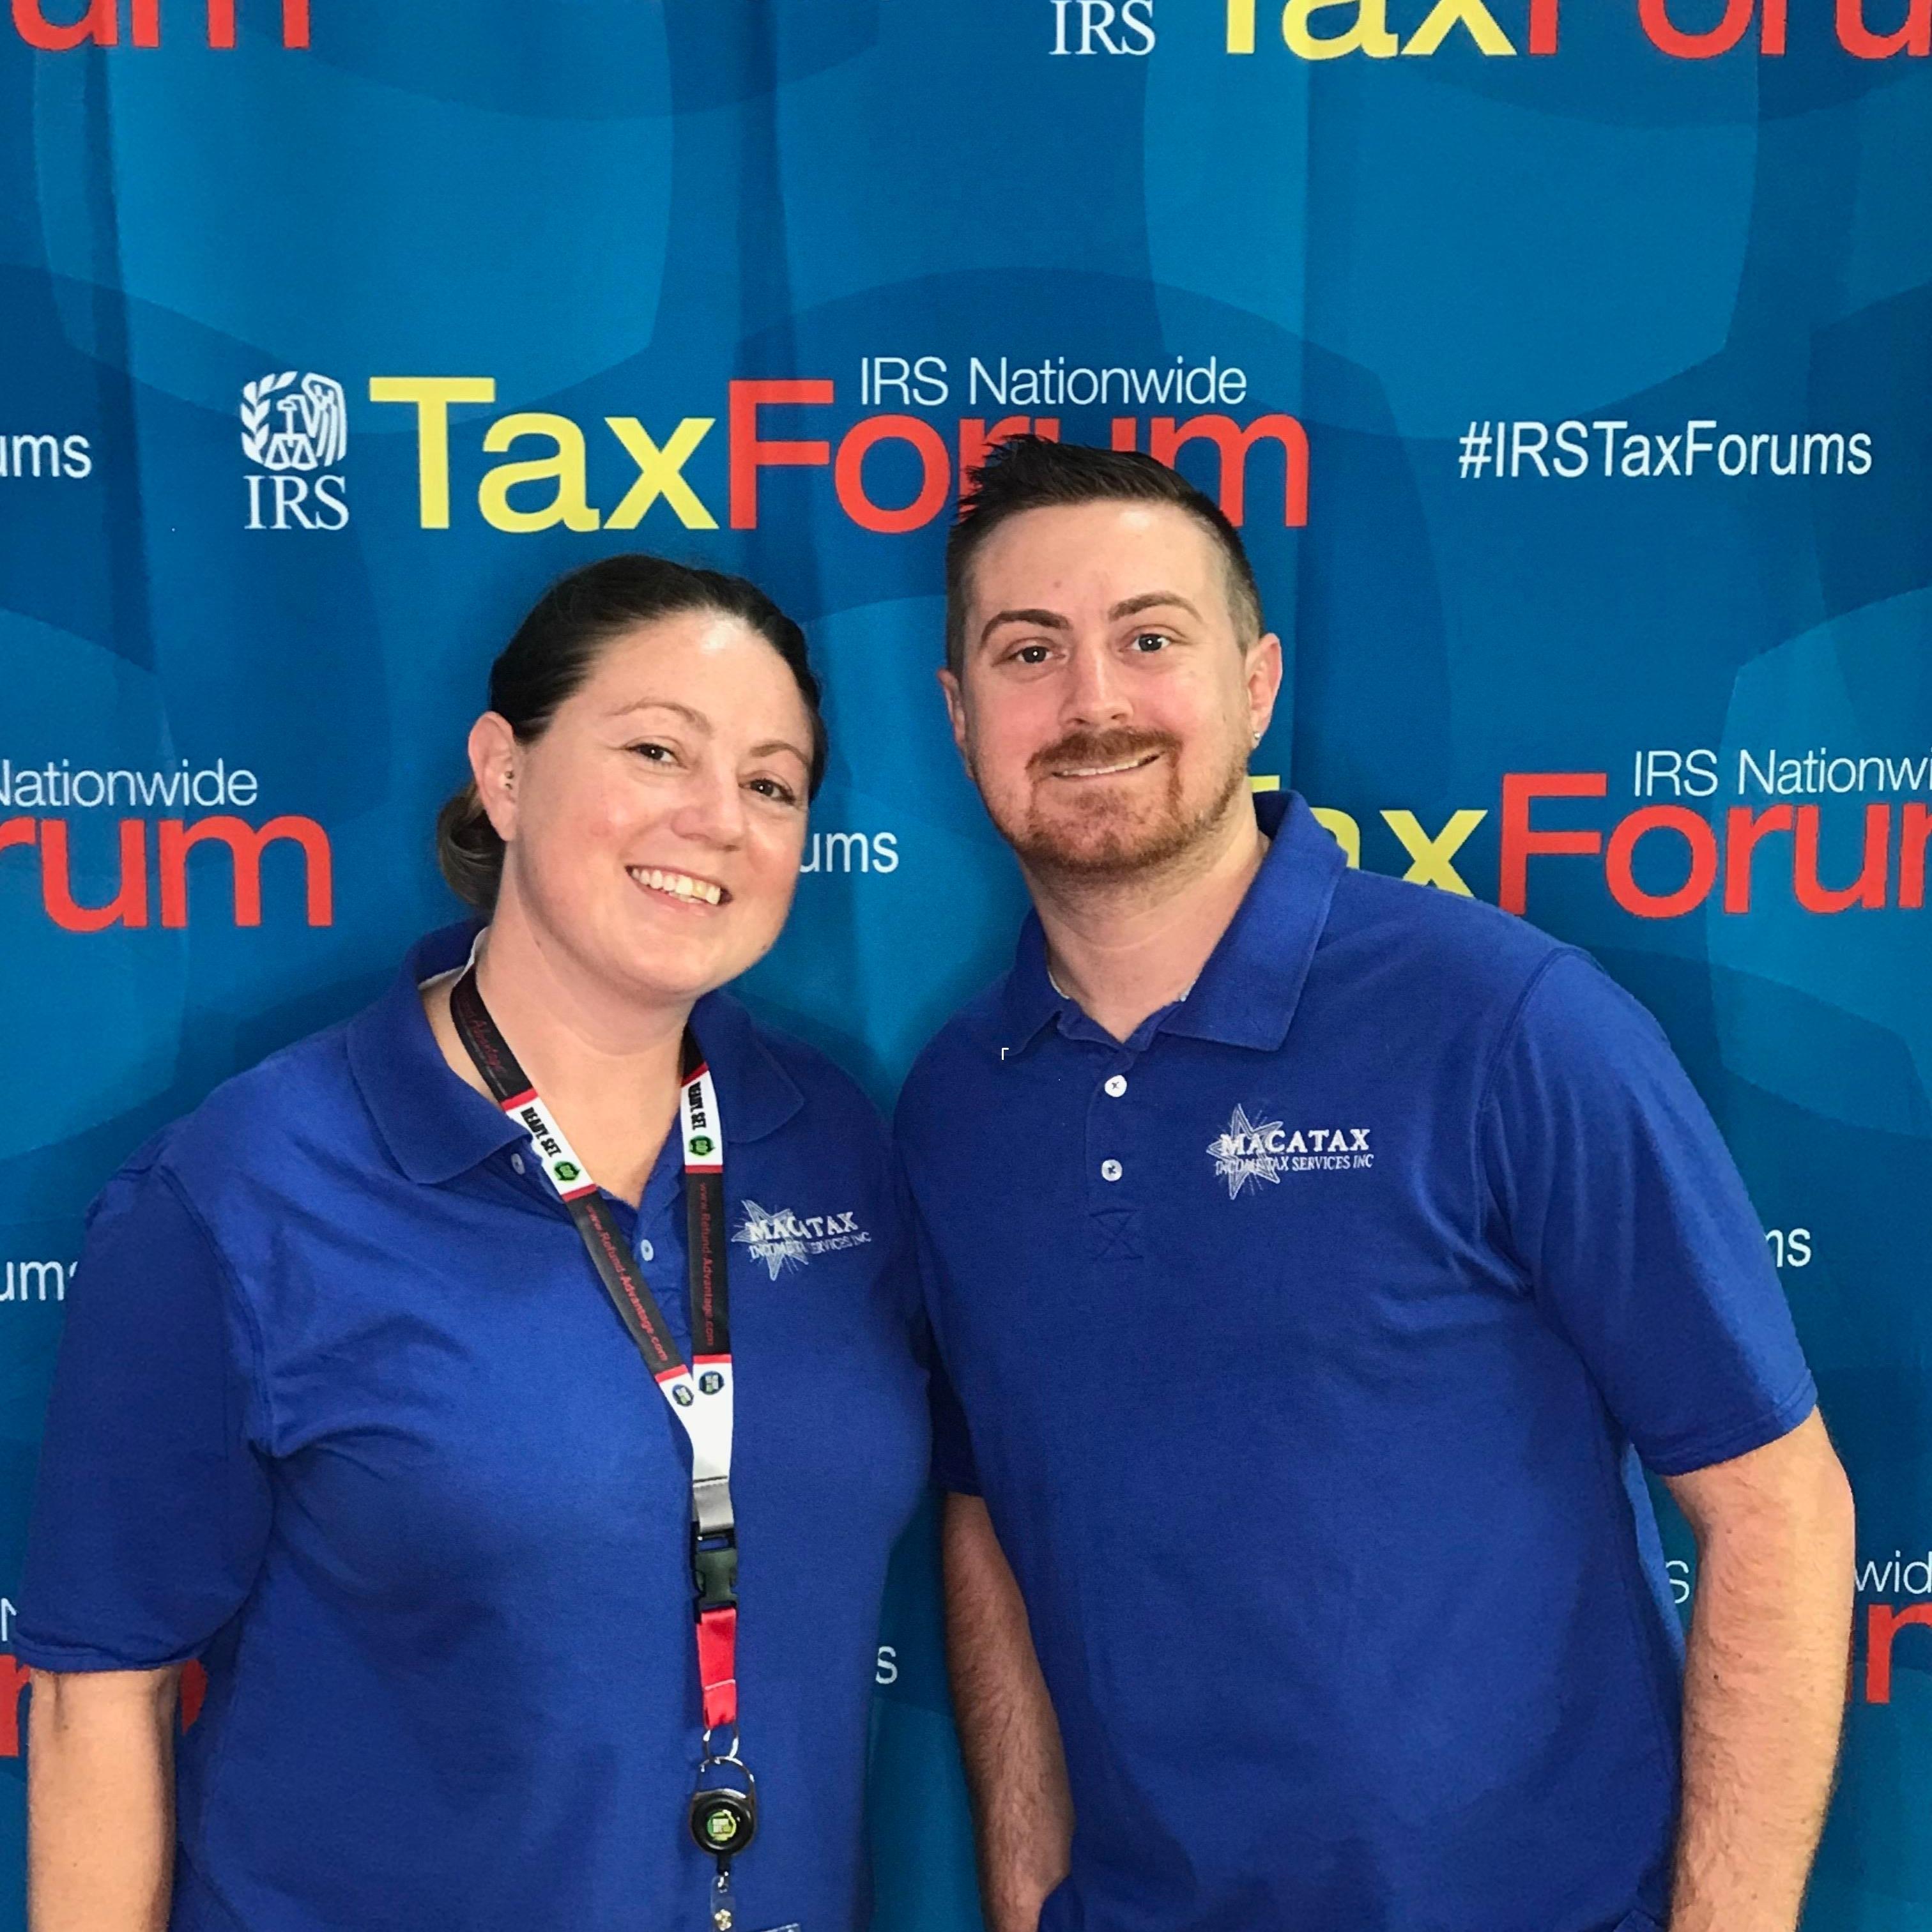 Macatax Income Tax Services